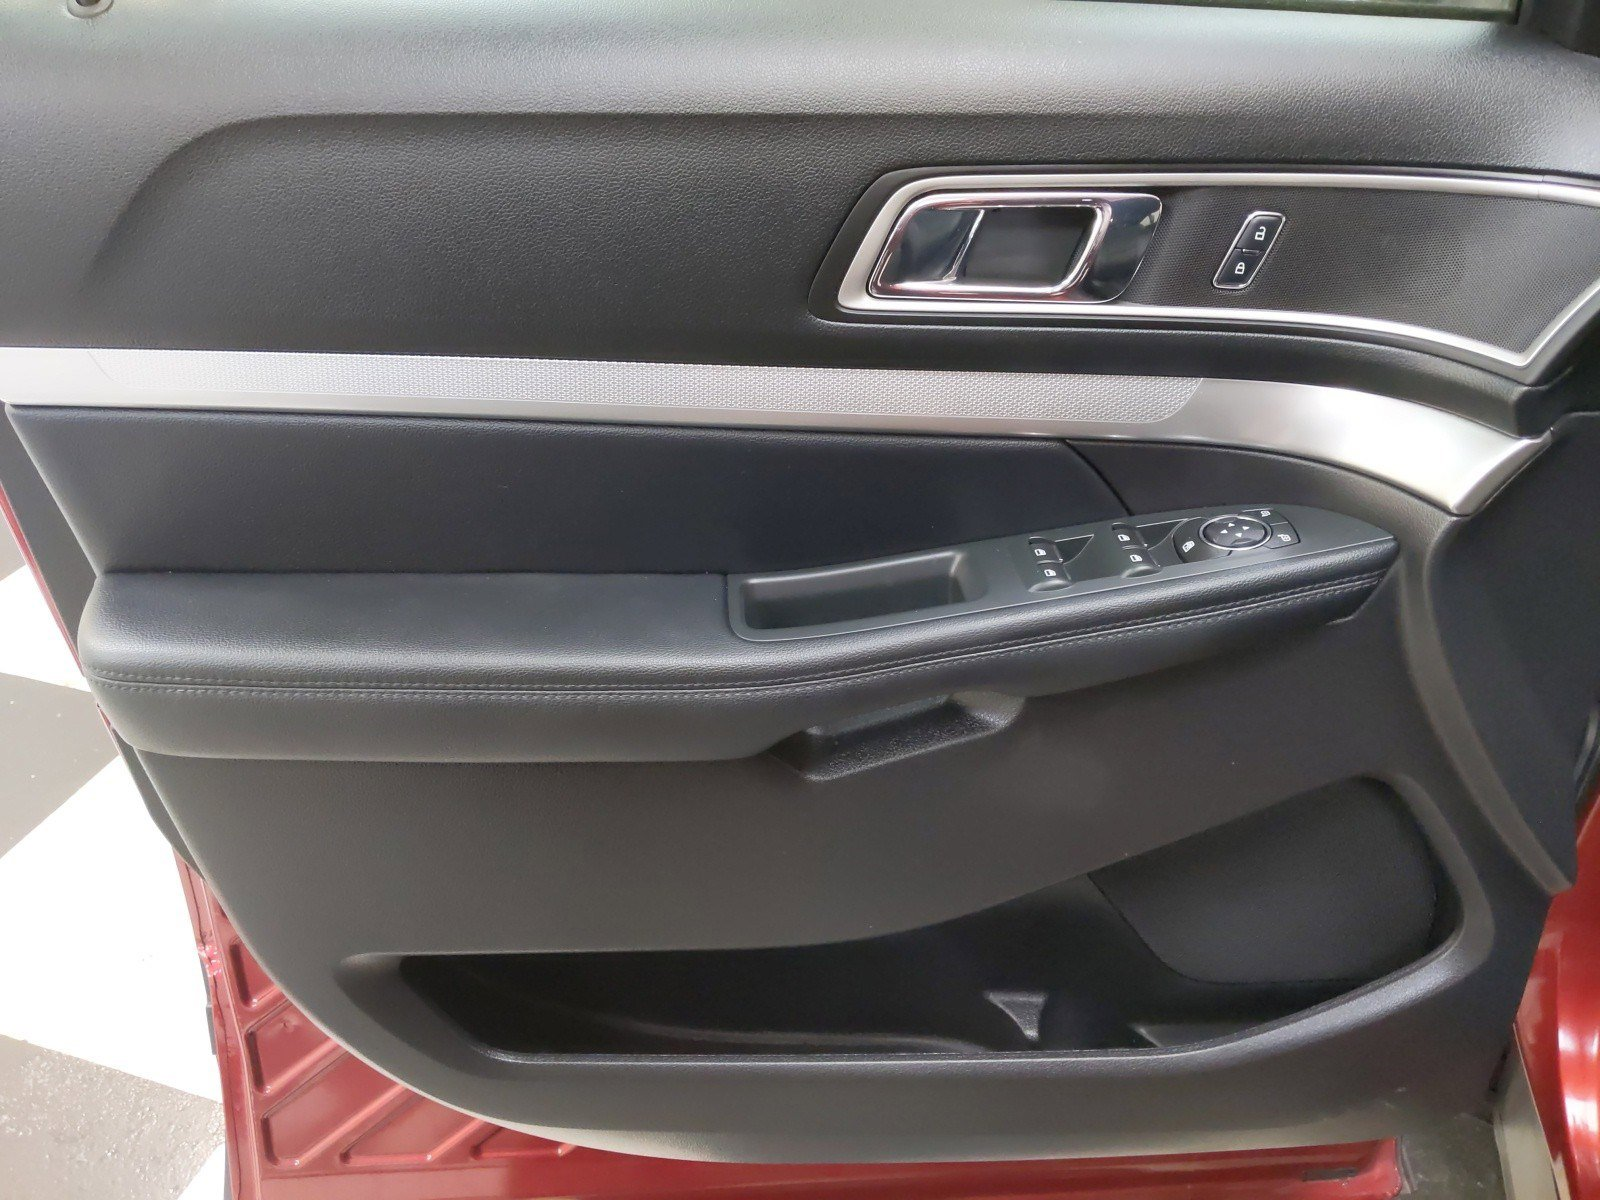 Used 2017 Ford Explorer XLT 4D Sport Utility for sale in Grand Island NE